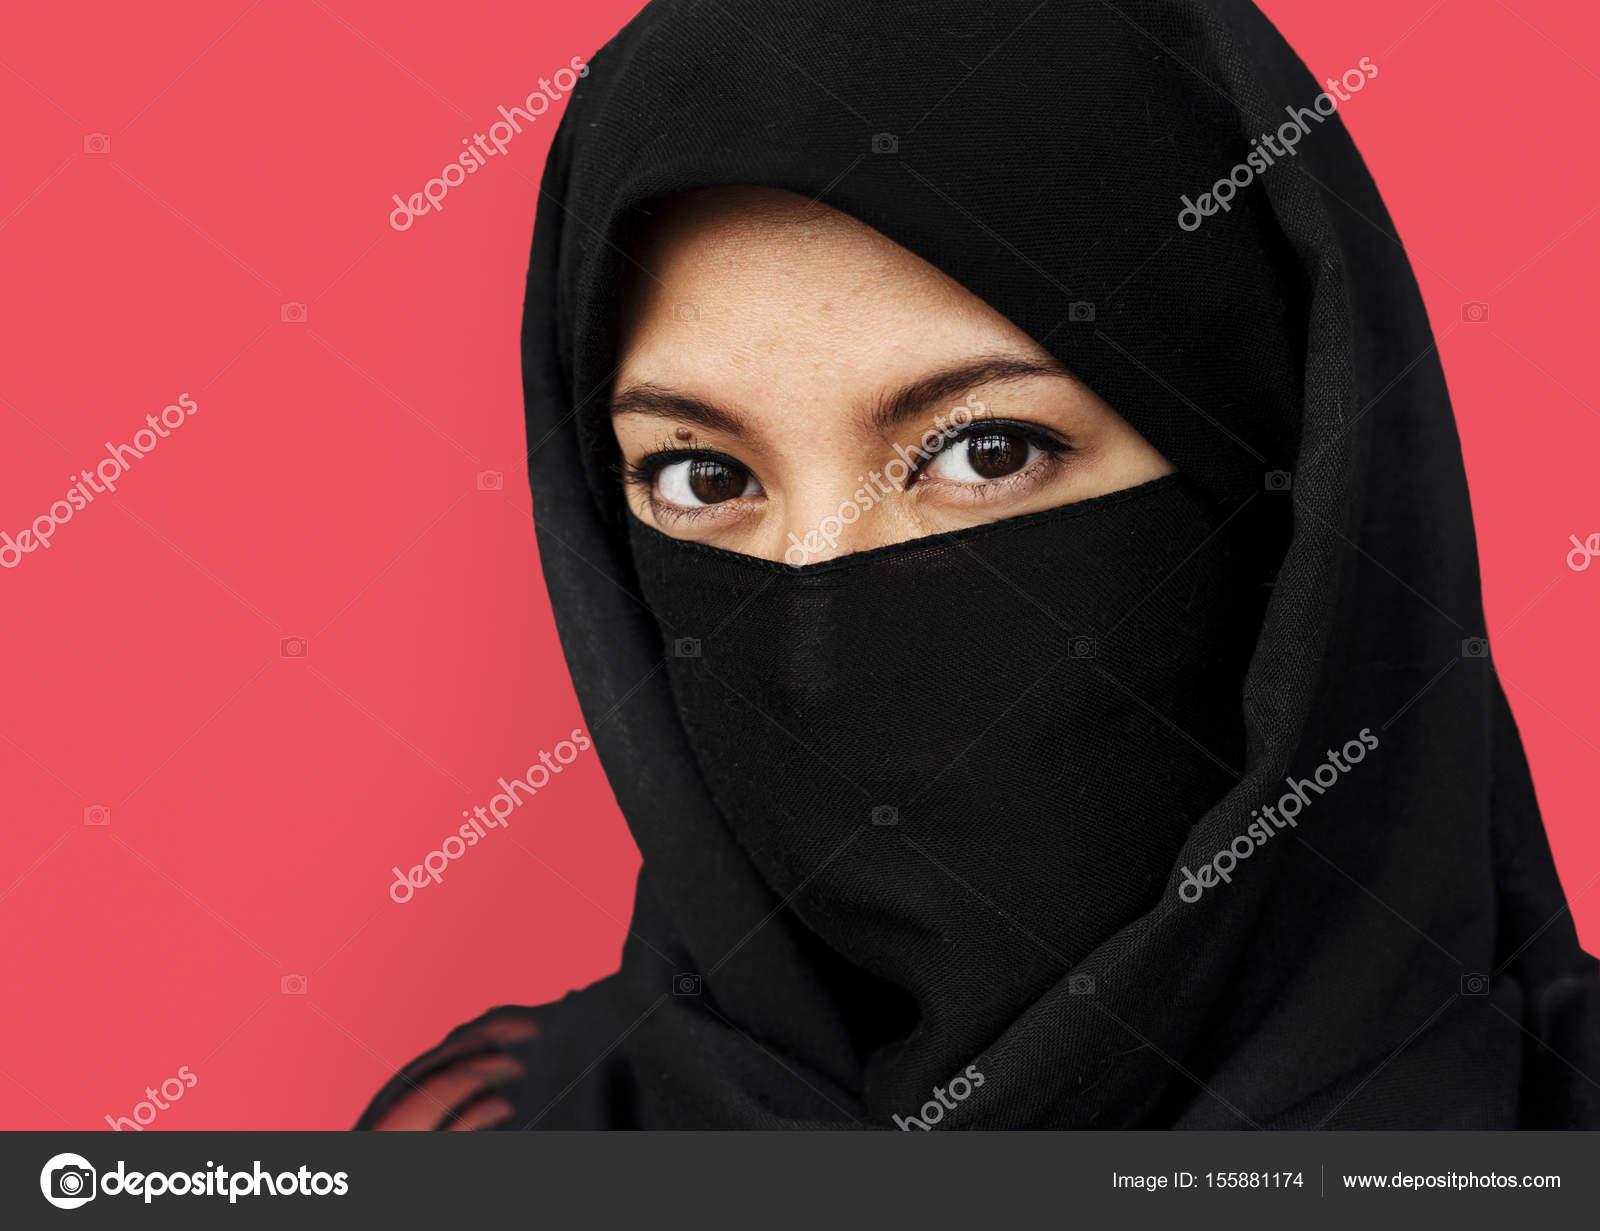 purdah のイスラム教徒の女性 ストック写真 rawpixel 155881174